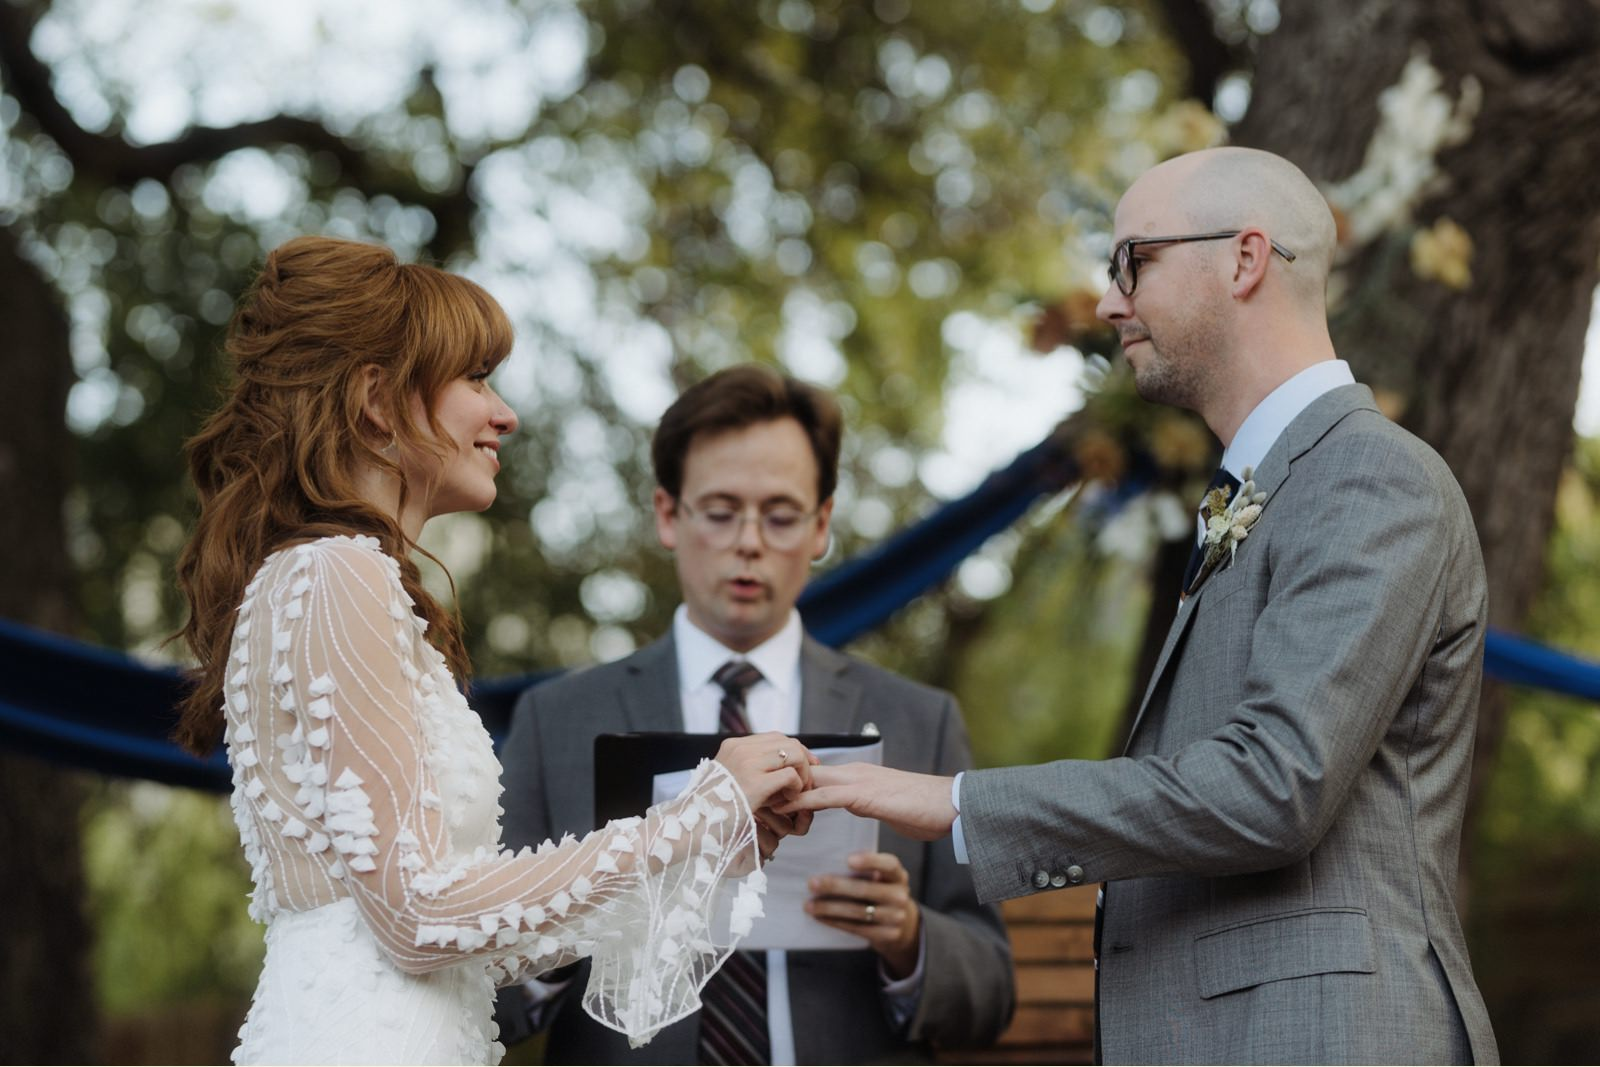 Bride and groom's ring exchange at Buka at Bouldin Creek